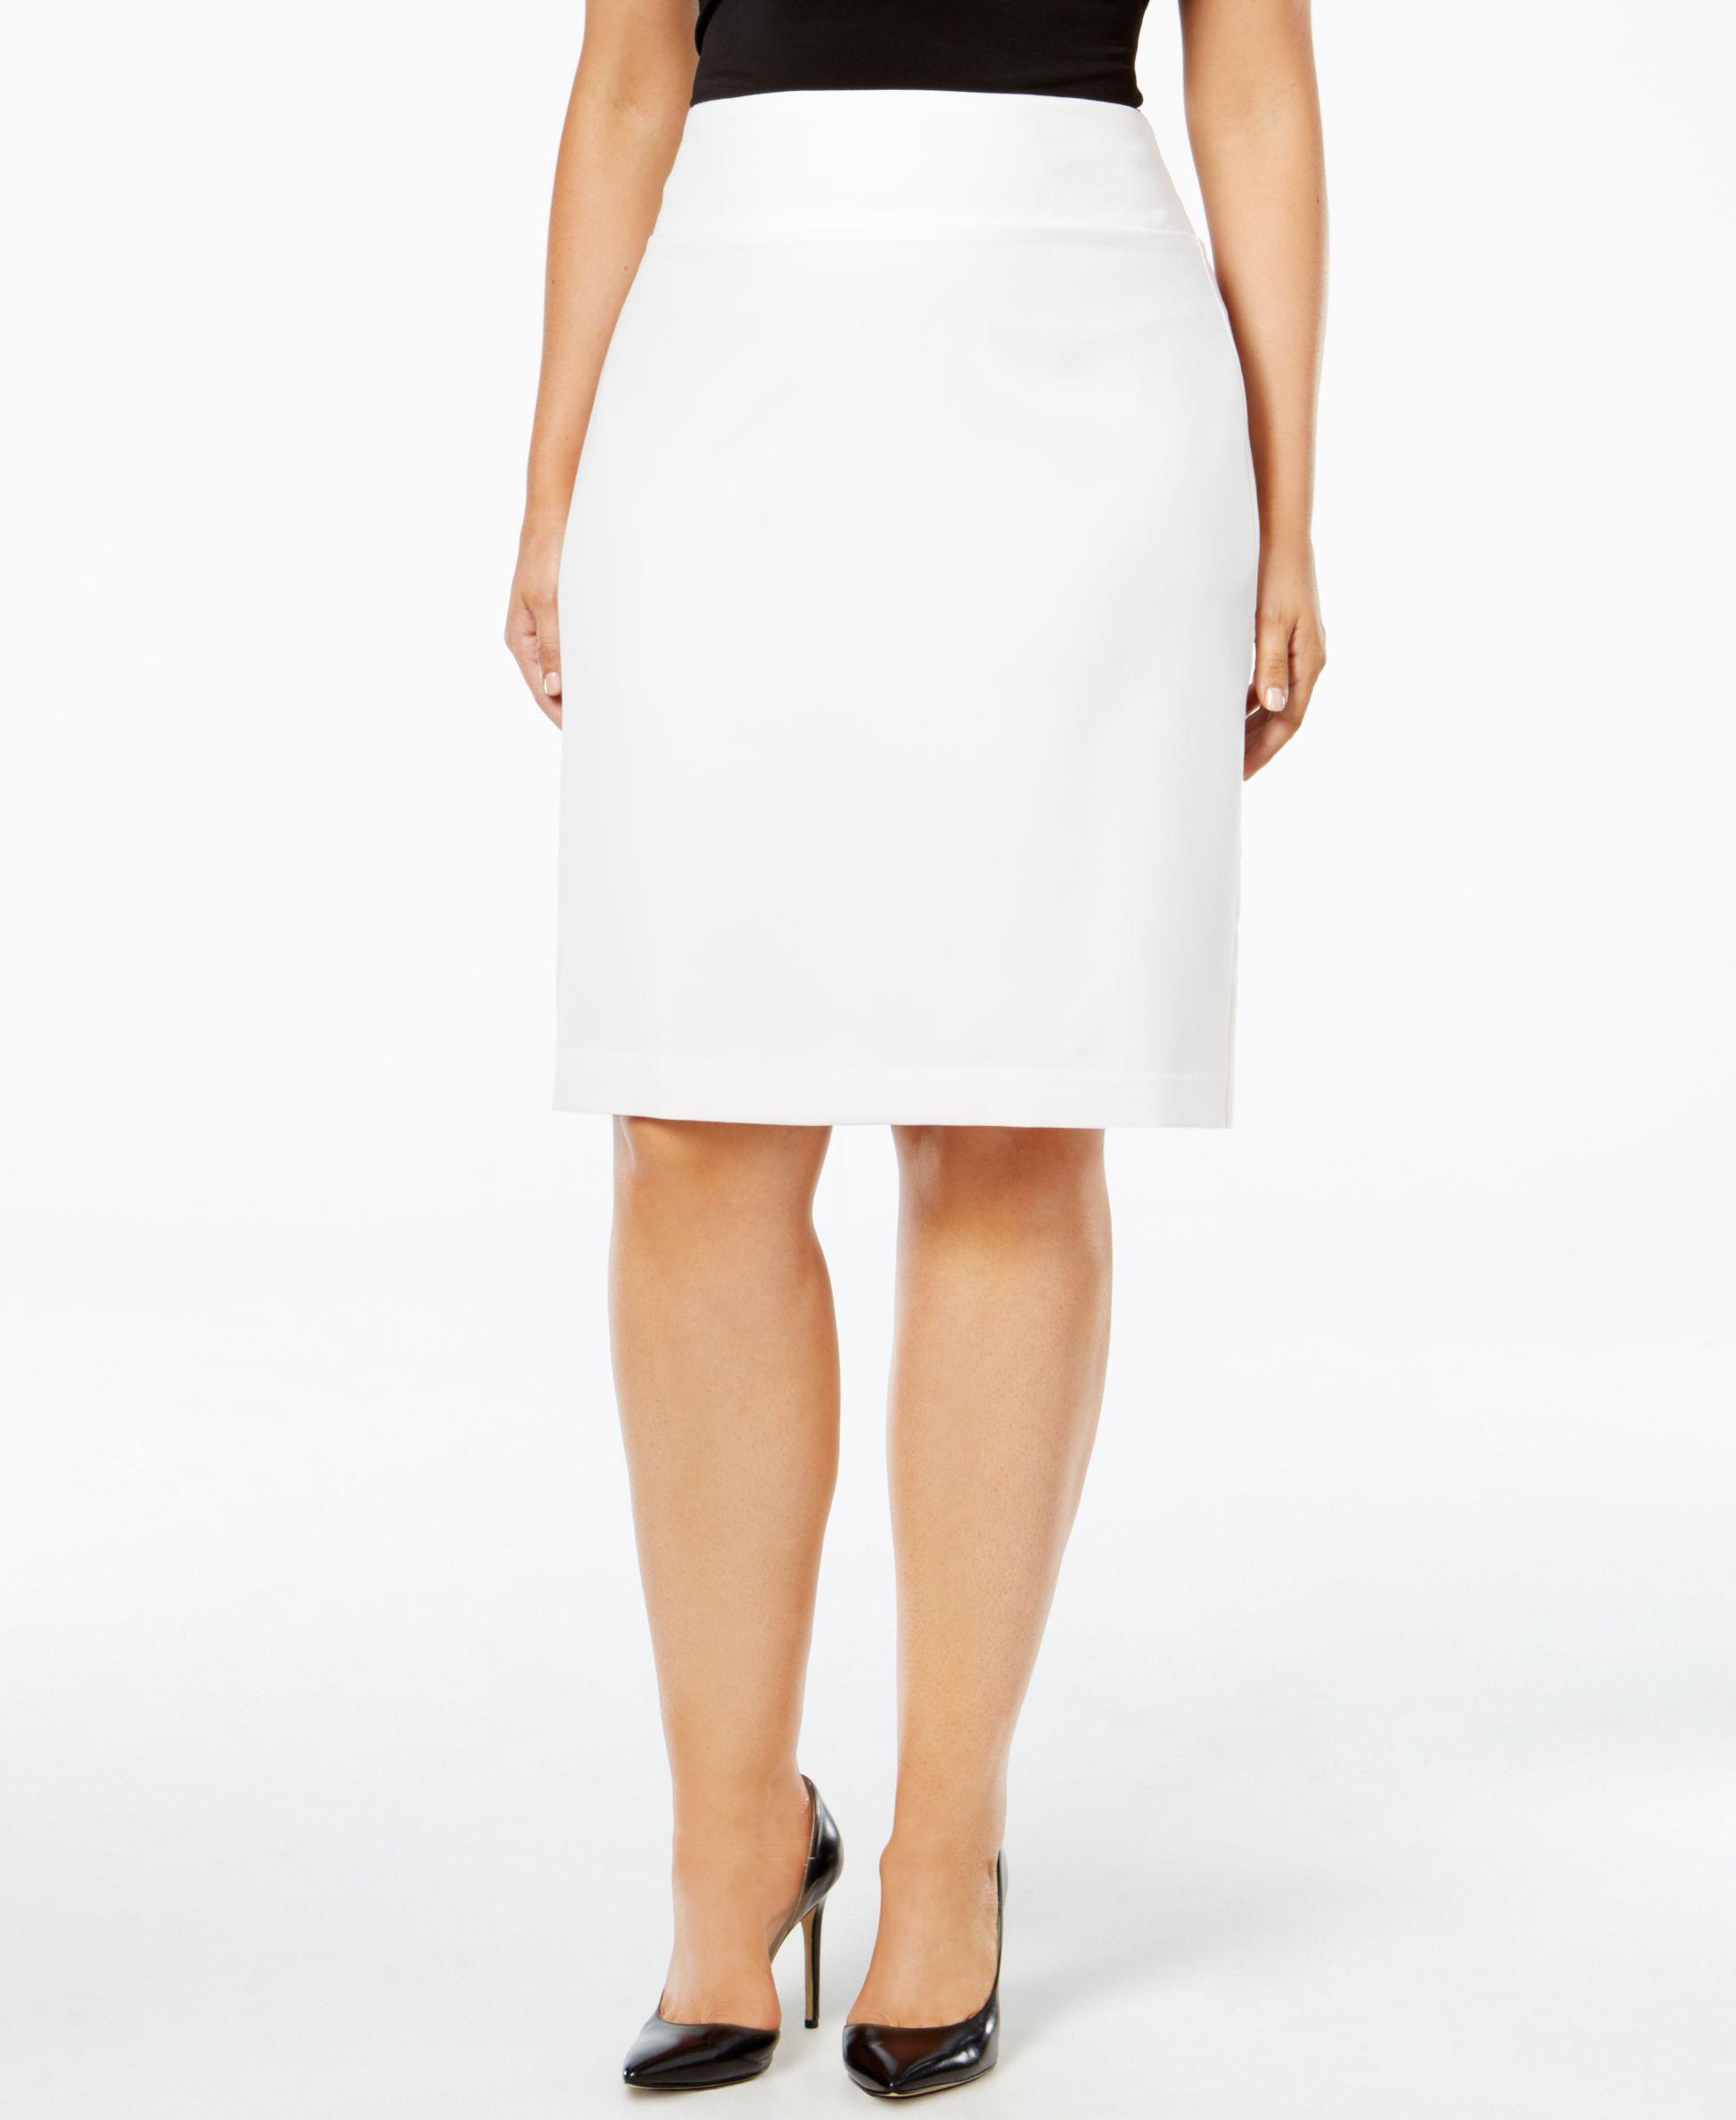 b9deaa32ff Alfani Plus Size Classic Pencil Skirt in White - Lyst